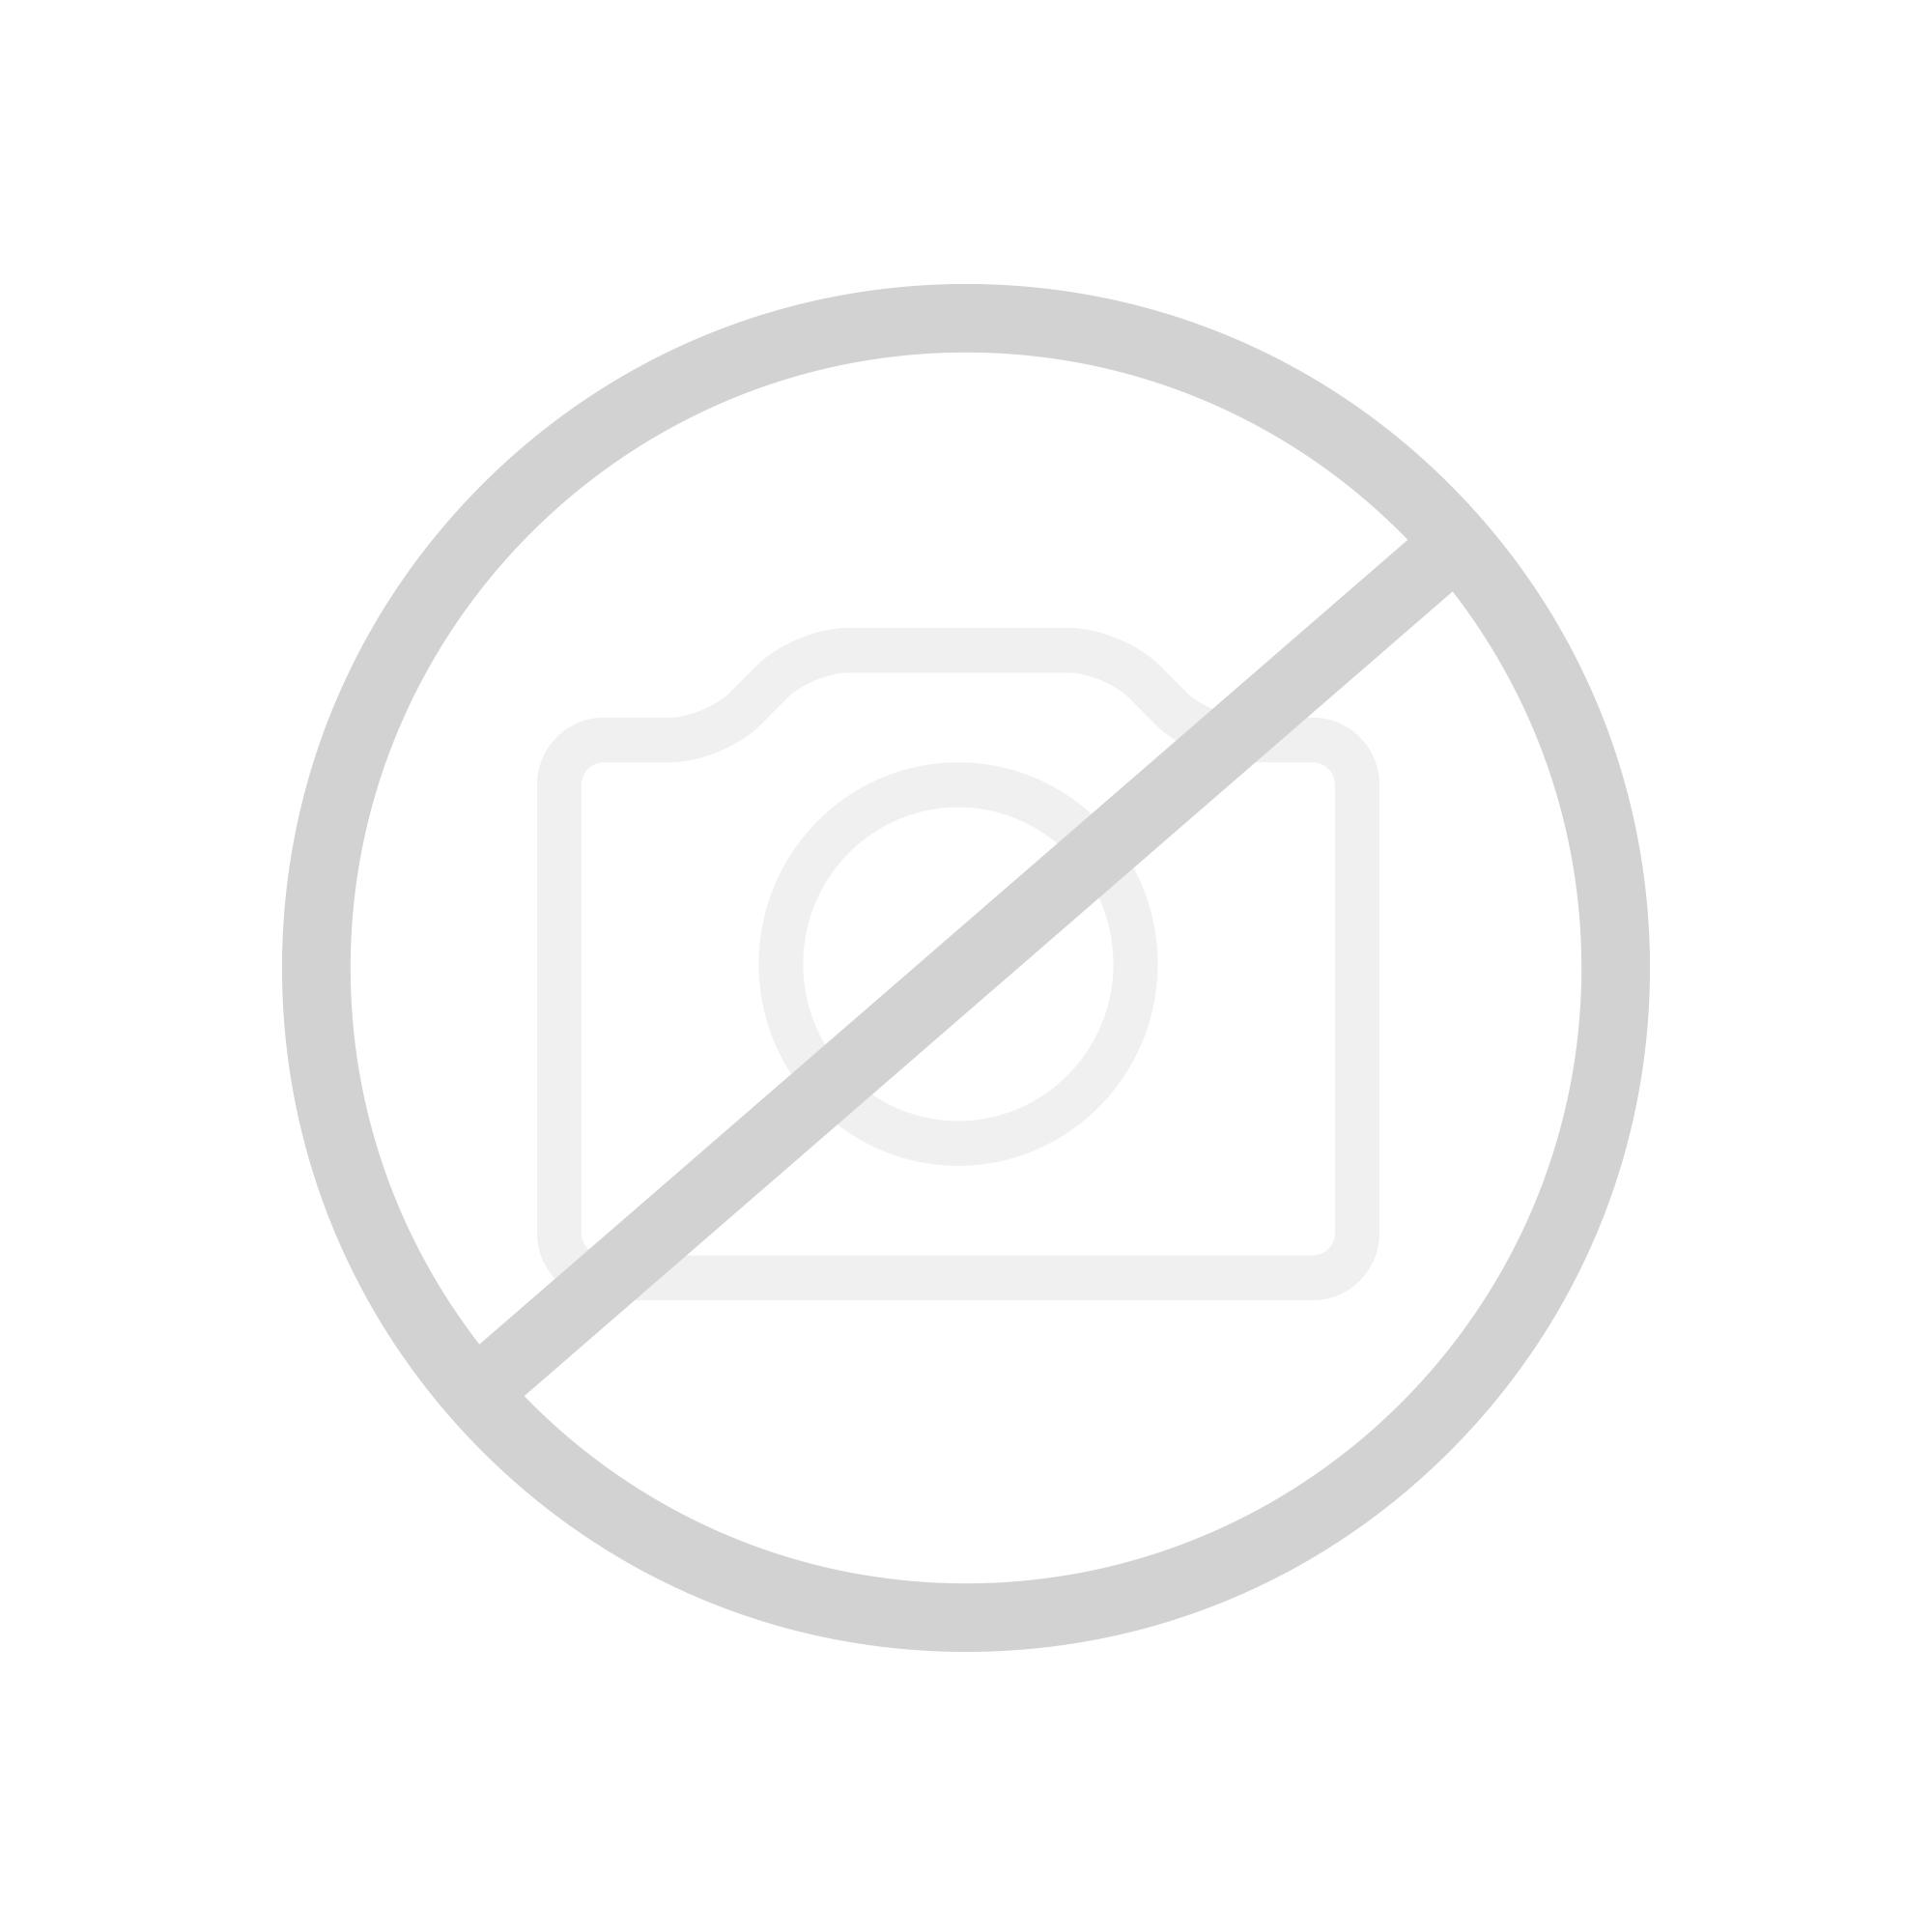 kaldewei centro duo rechteck badewanne pergamon 283330000231 reuter onlineshop. Black Bedroom Furniture Sets. Home Design Ideas